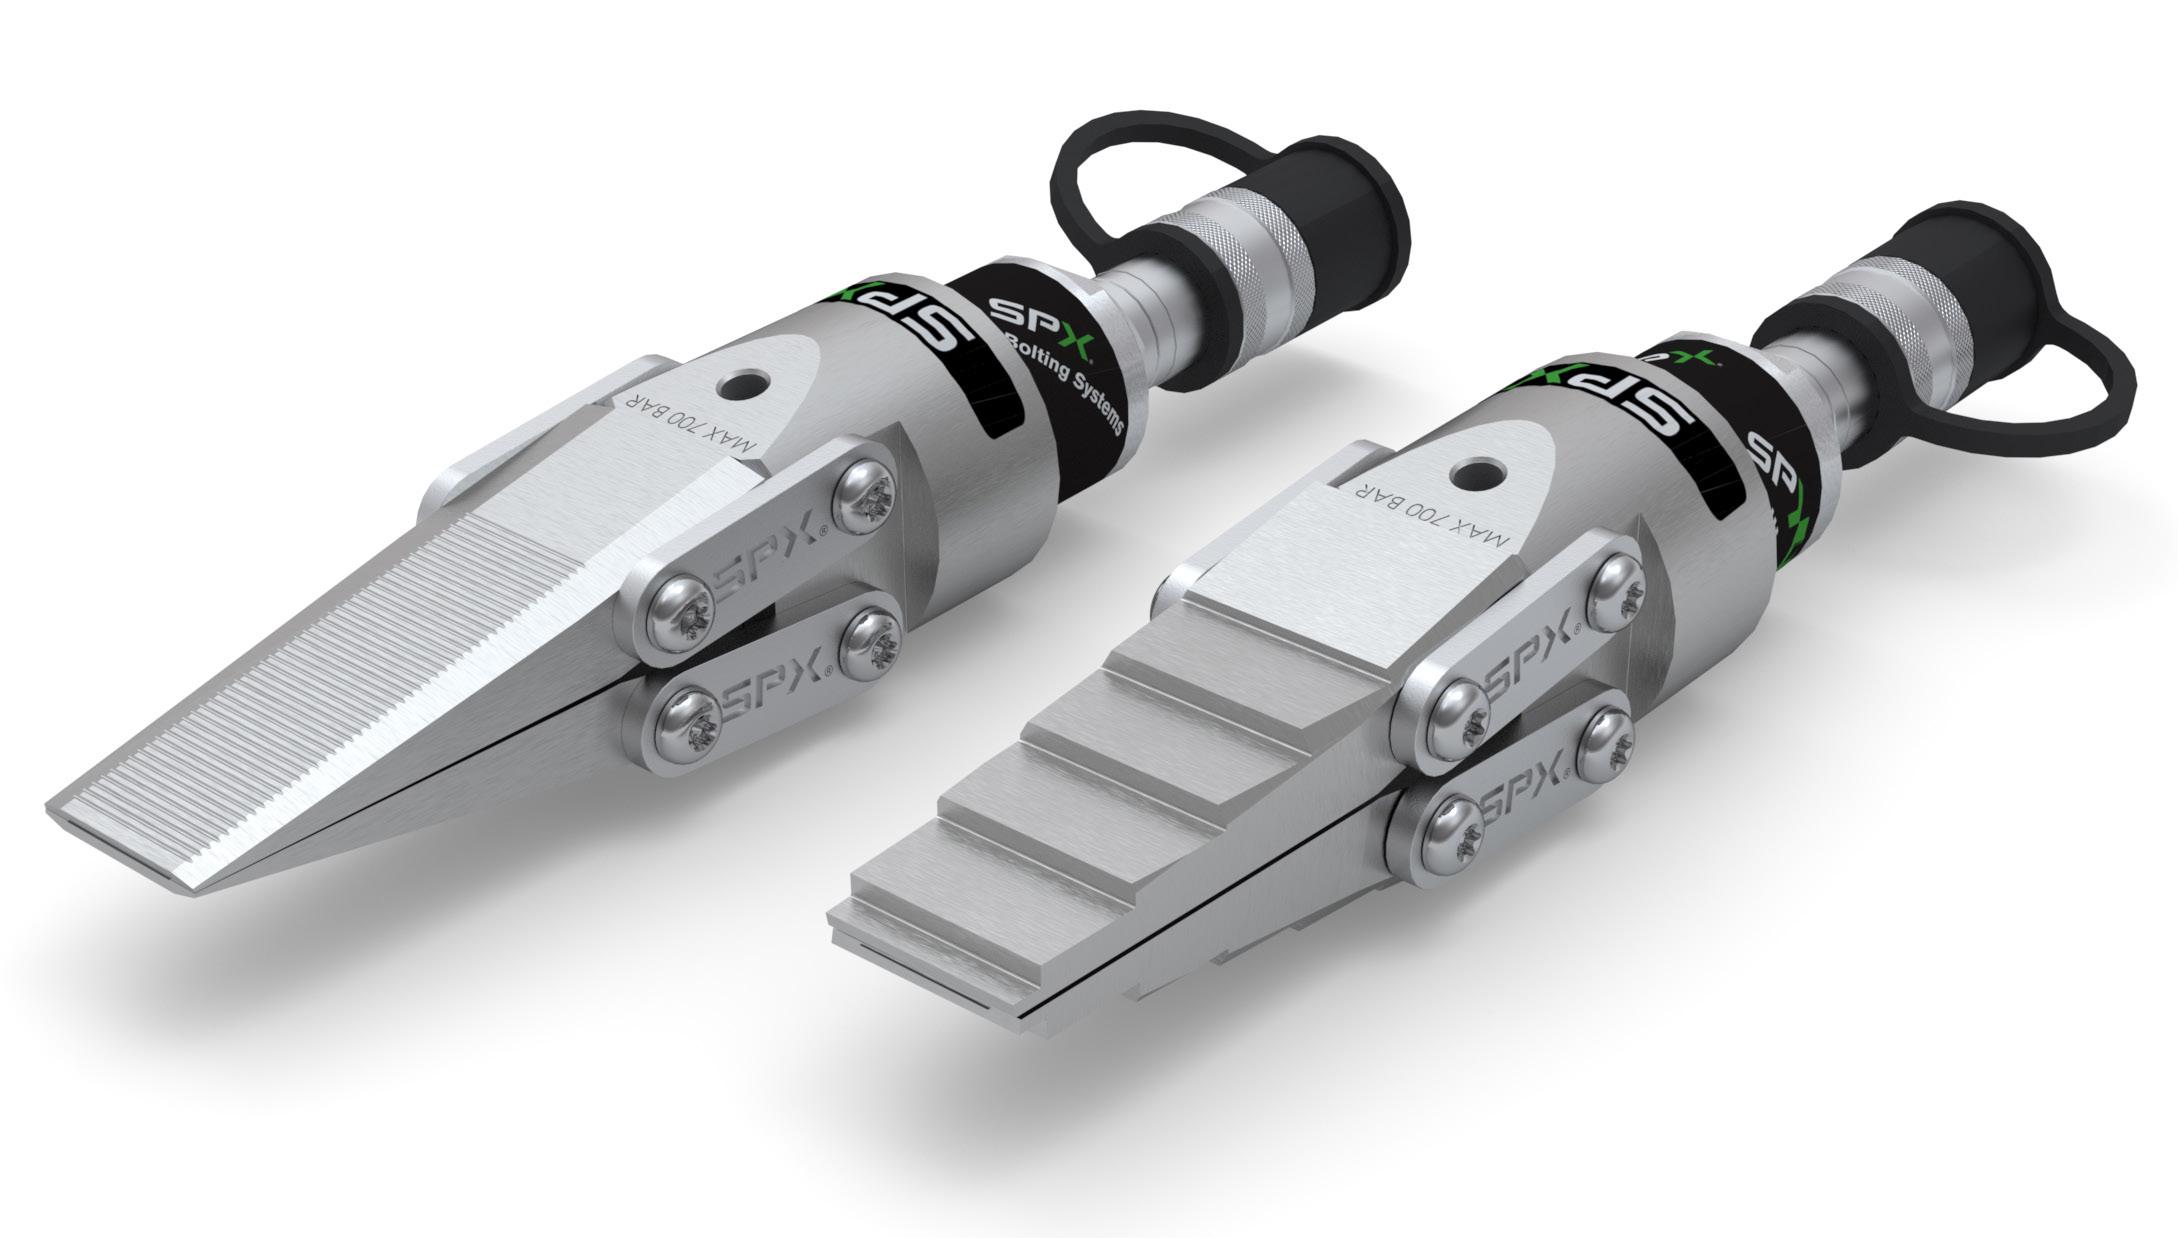 Separador hidraulico  FLS15 y FLS ST